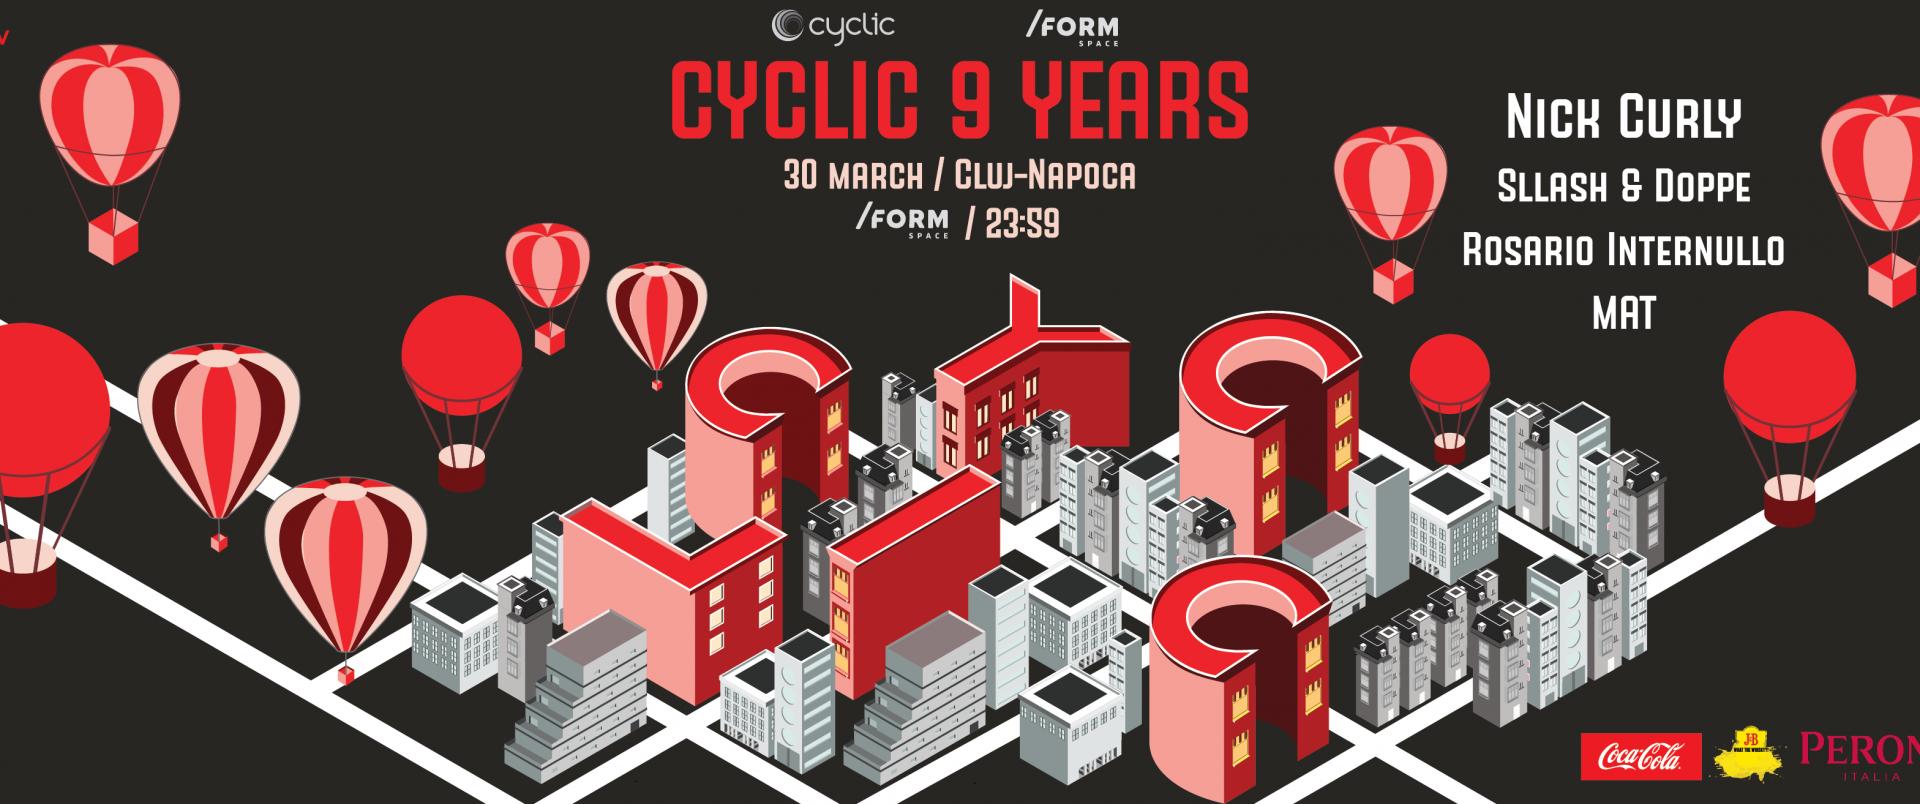 Cyclic 9 Years Anniversary in Cluj-Napoca